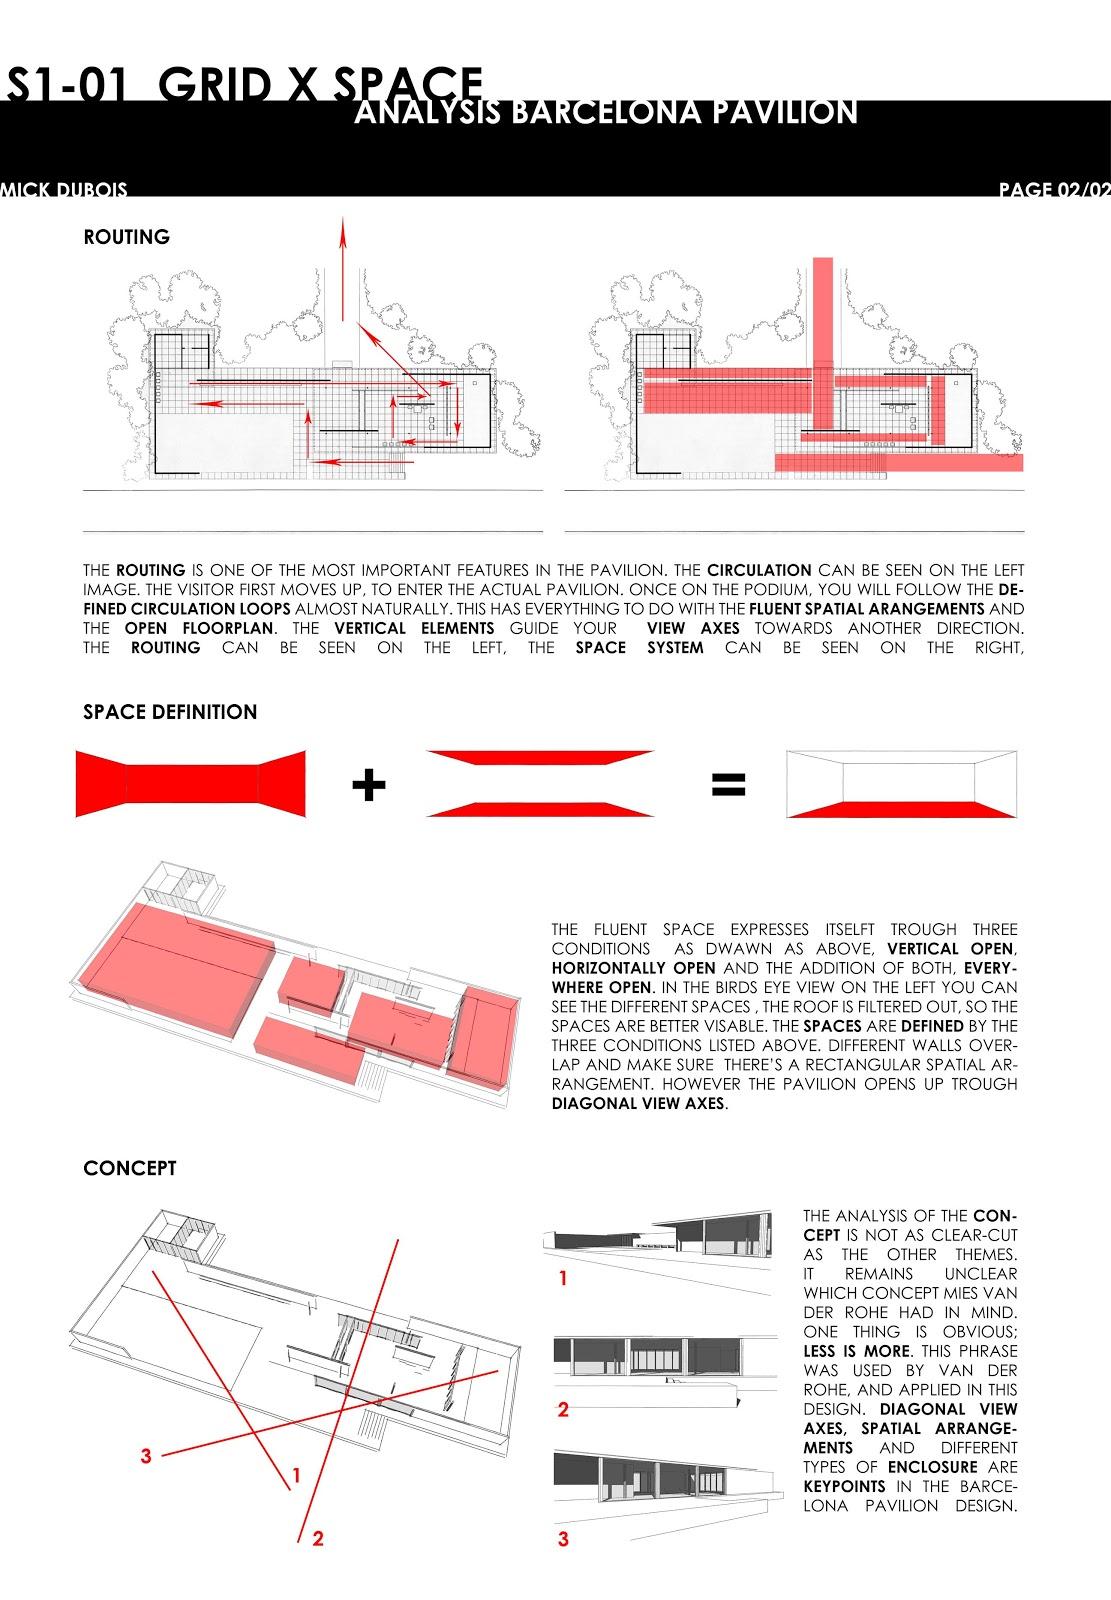 Architecture As Aesthetics  Barcelona Pavilion